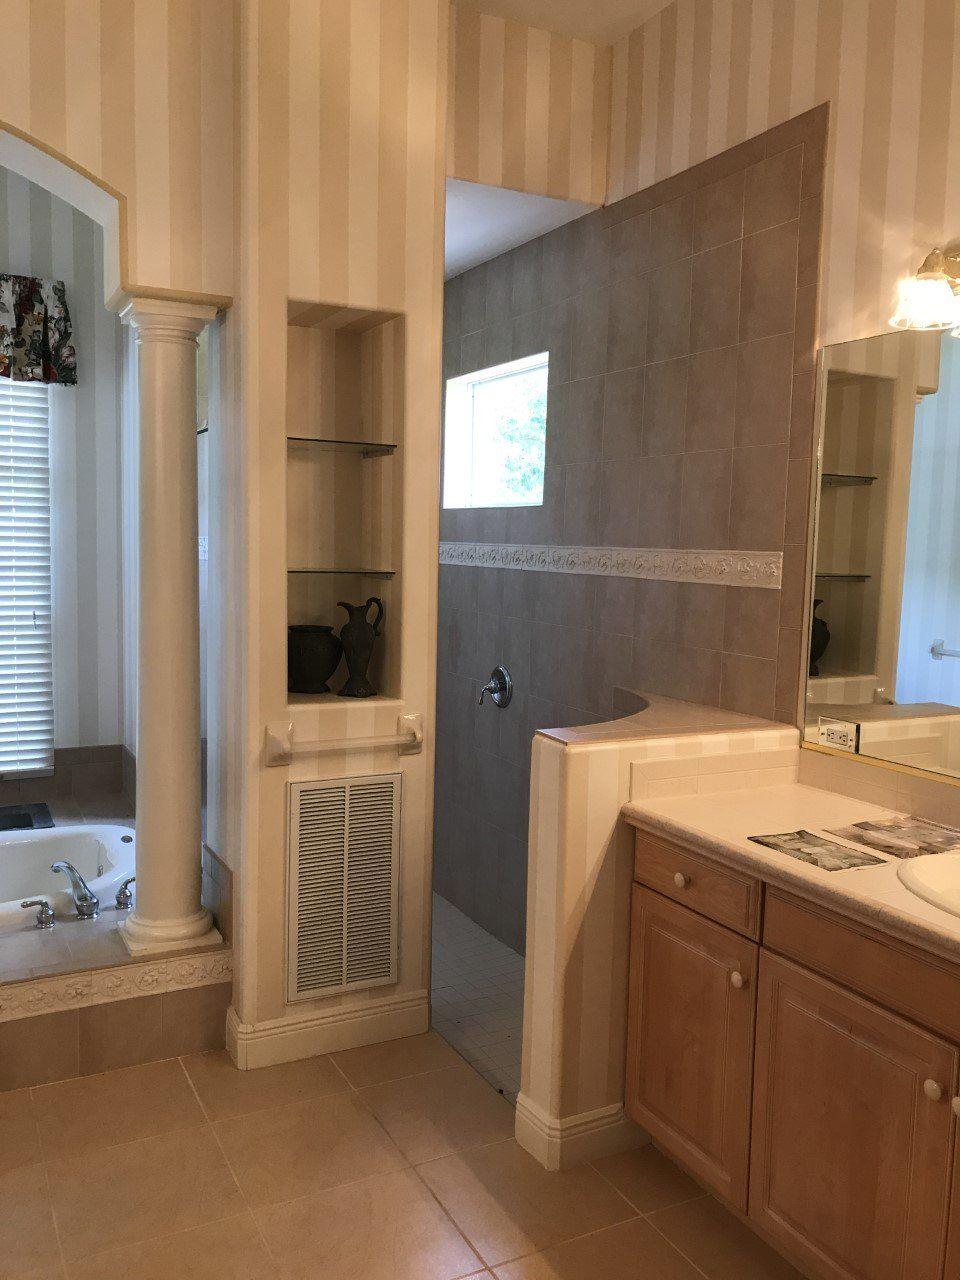 Express Bathrooms of Naples | Design Renovation | Naples, FL